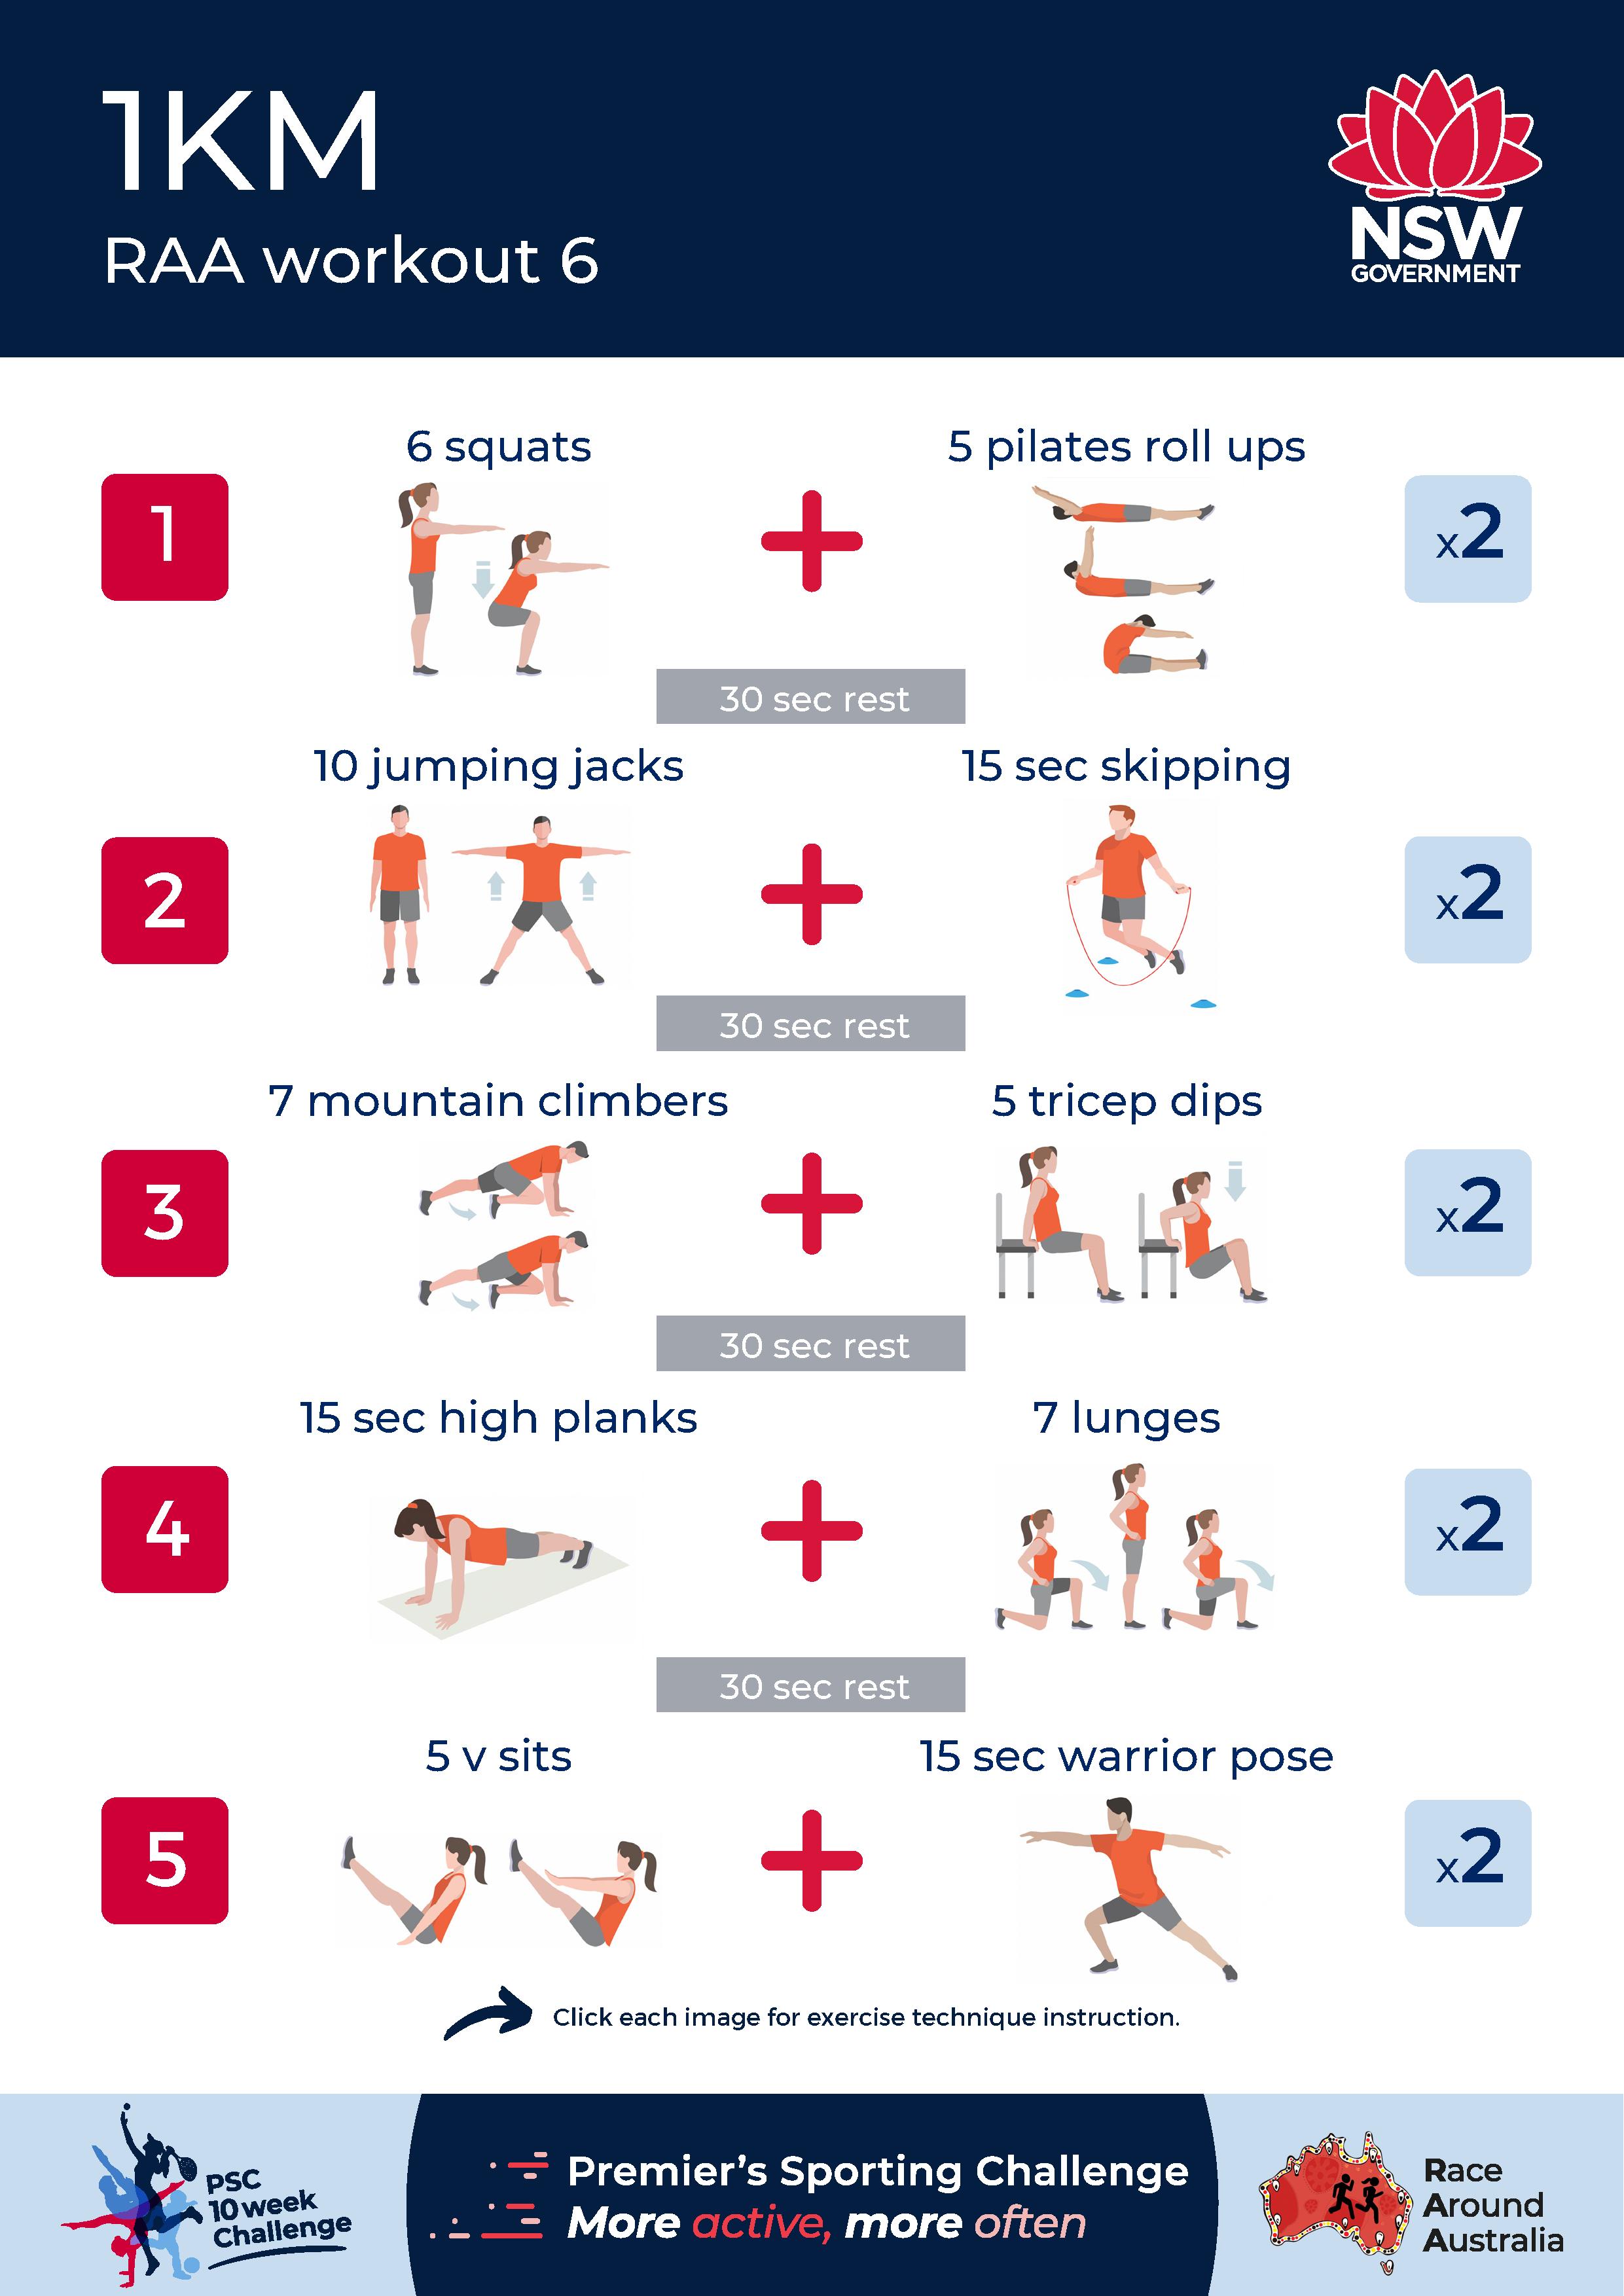 1km workout set preview image